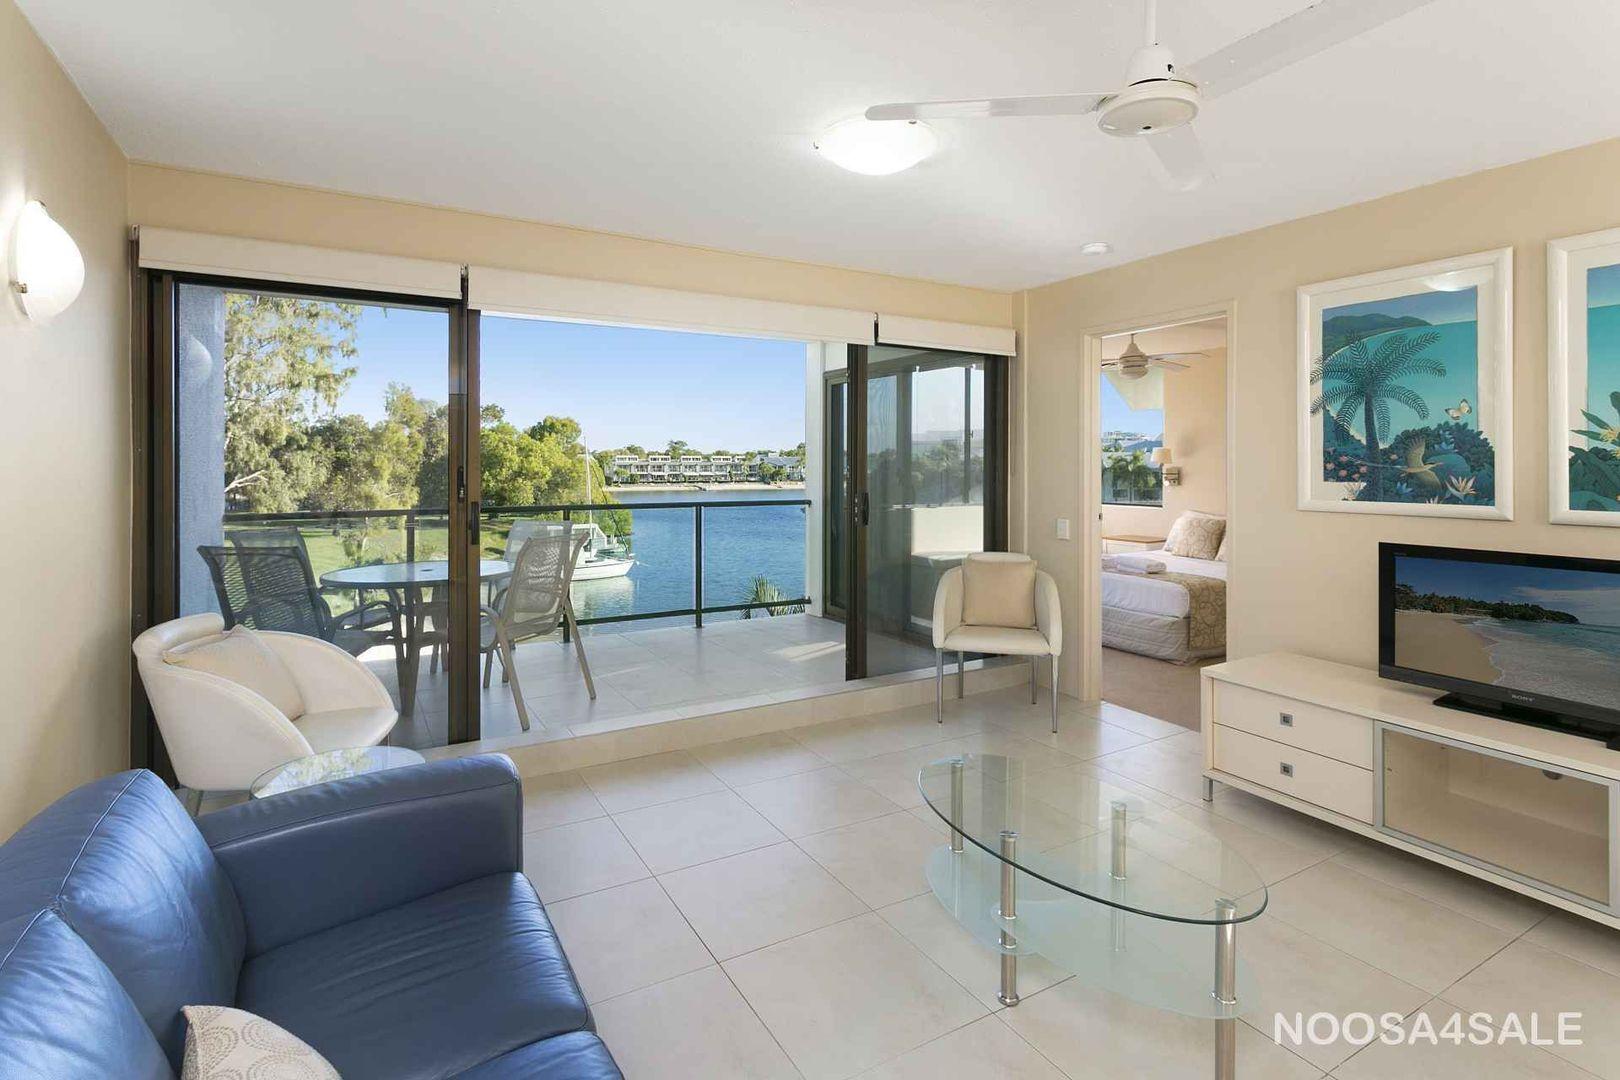 20/1 Quamby Place, Noosa Heads QLD 4567, Image 1